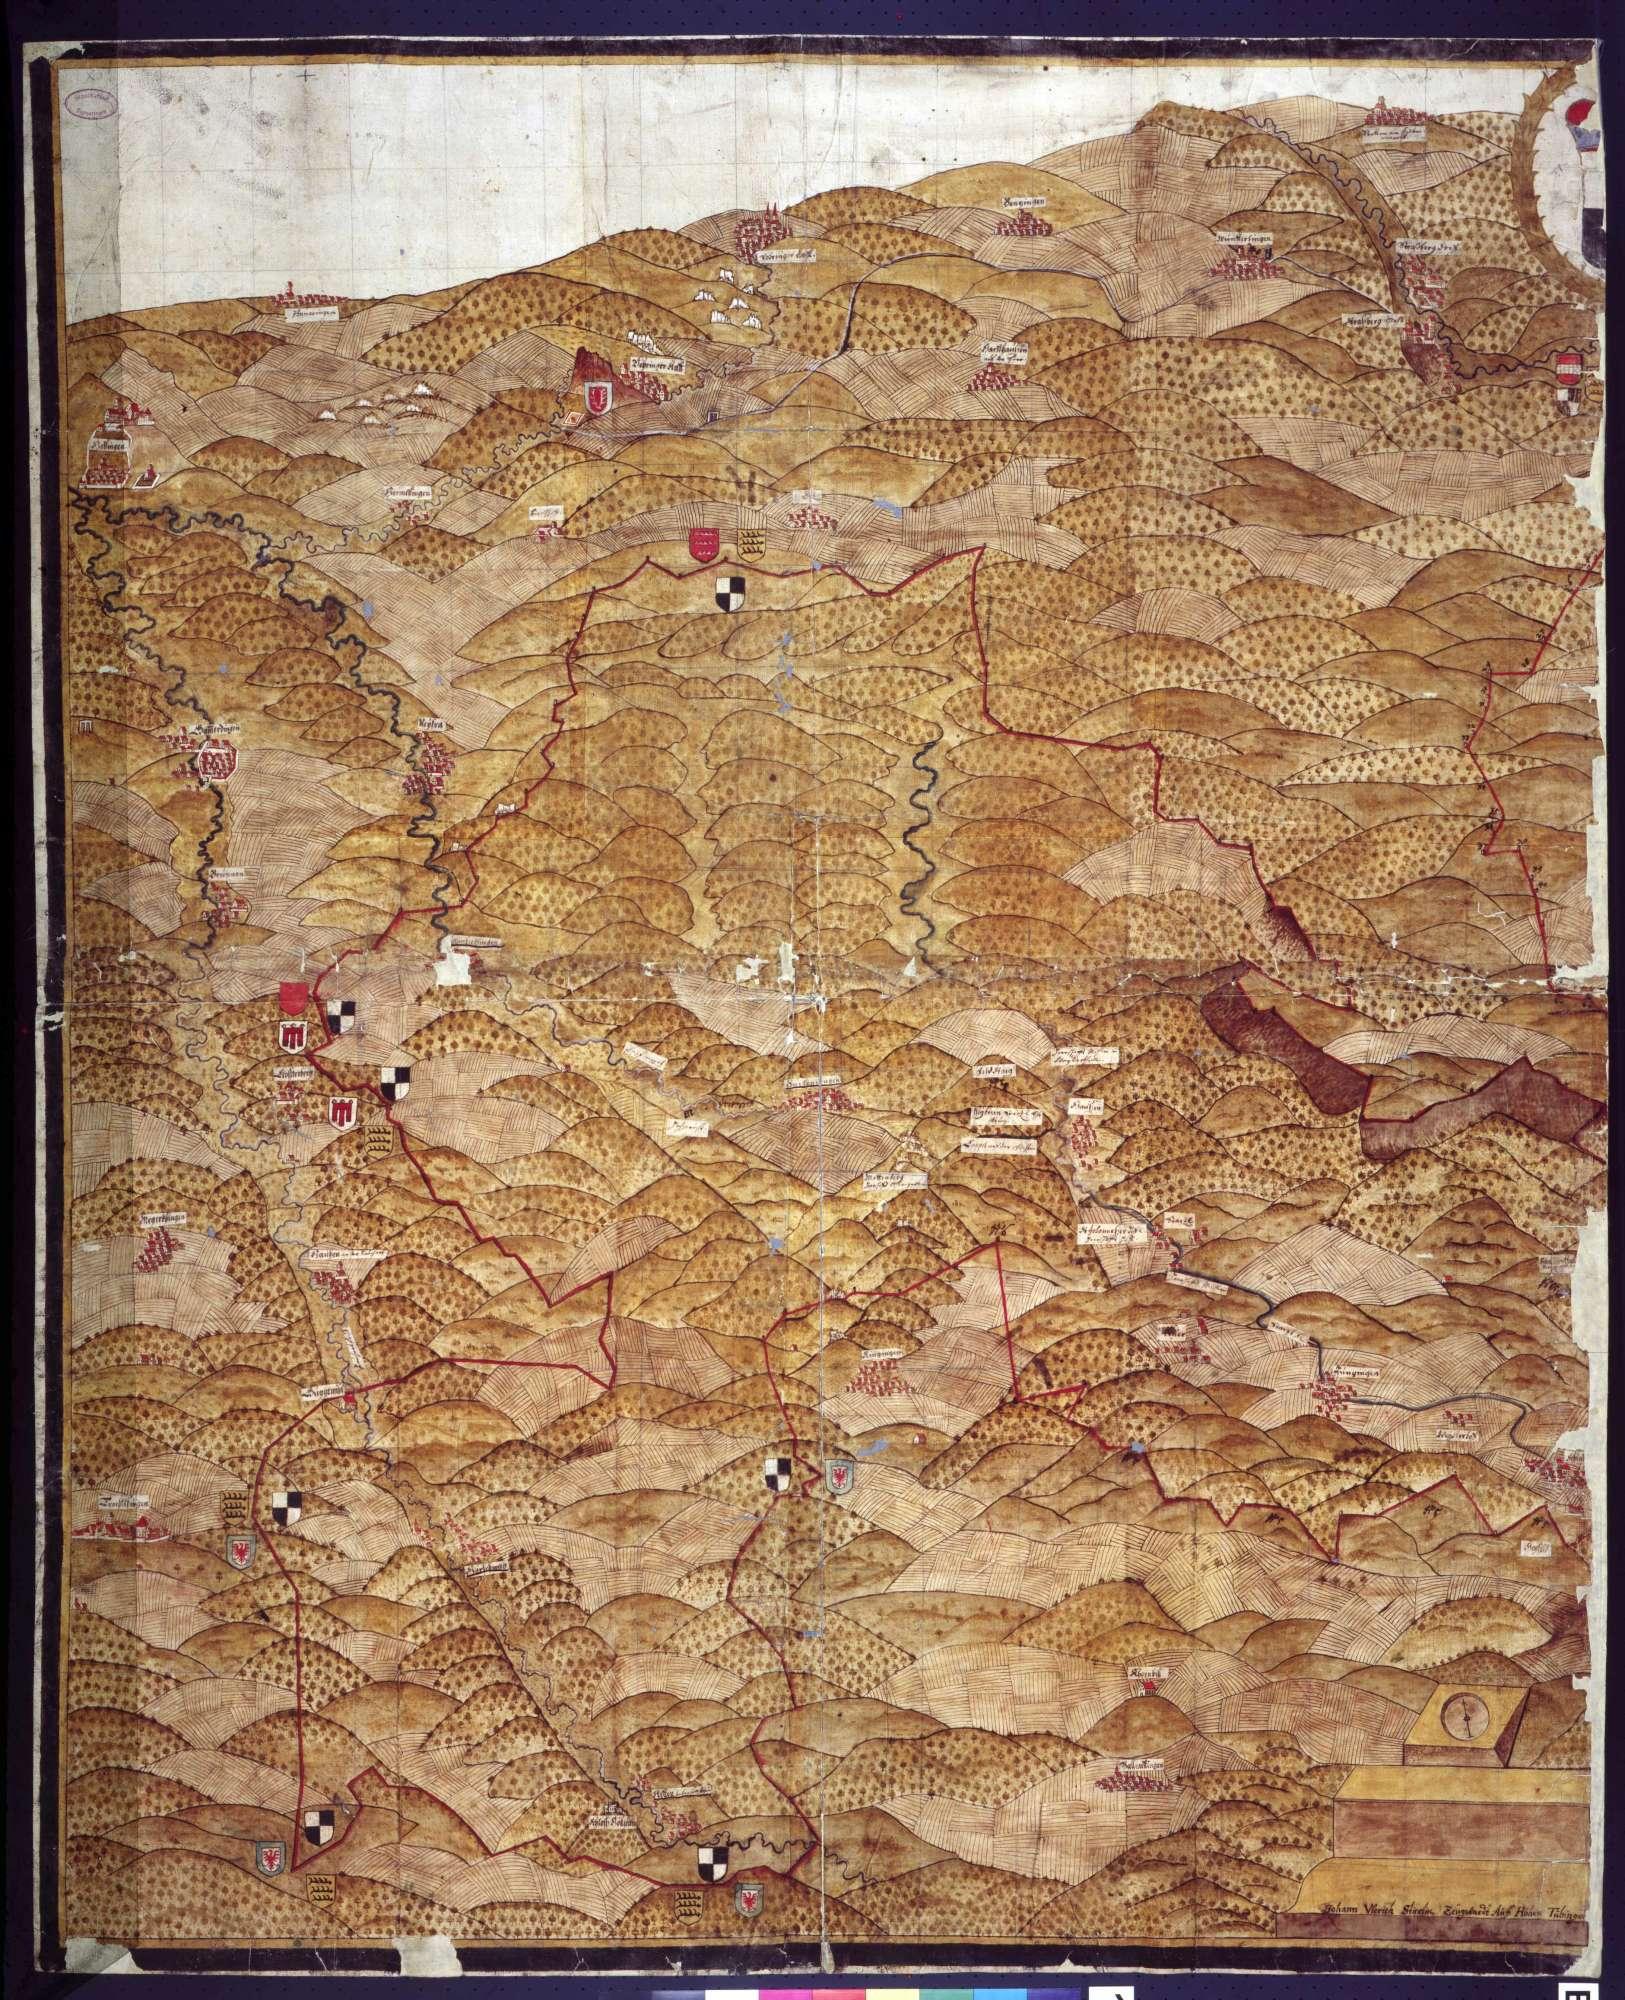 Hohenzollern-Hechingische Landkarte, Bild 1